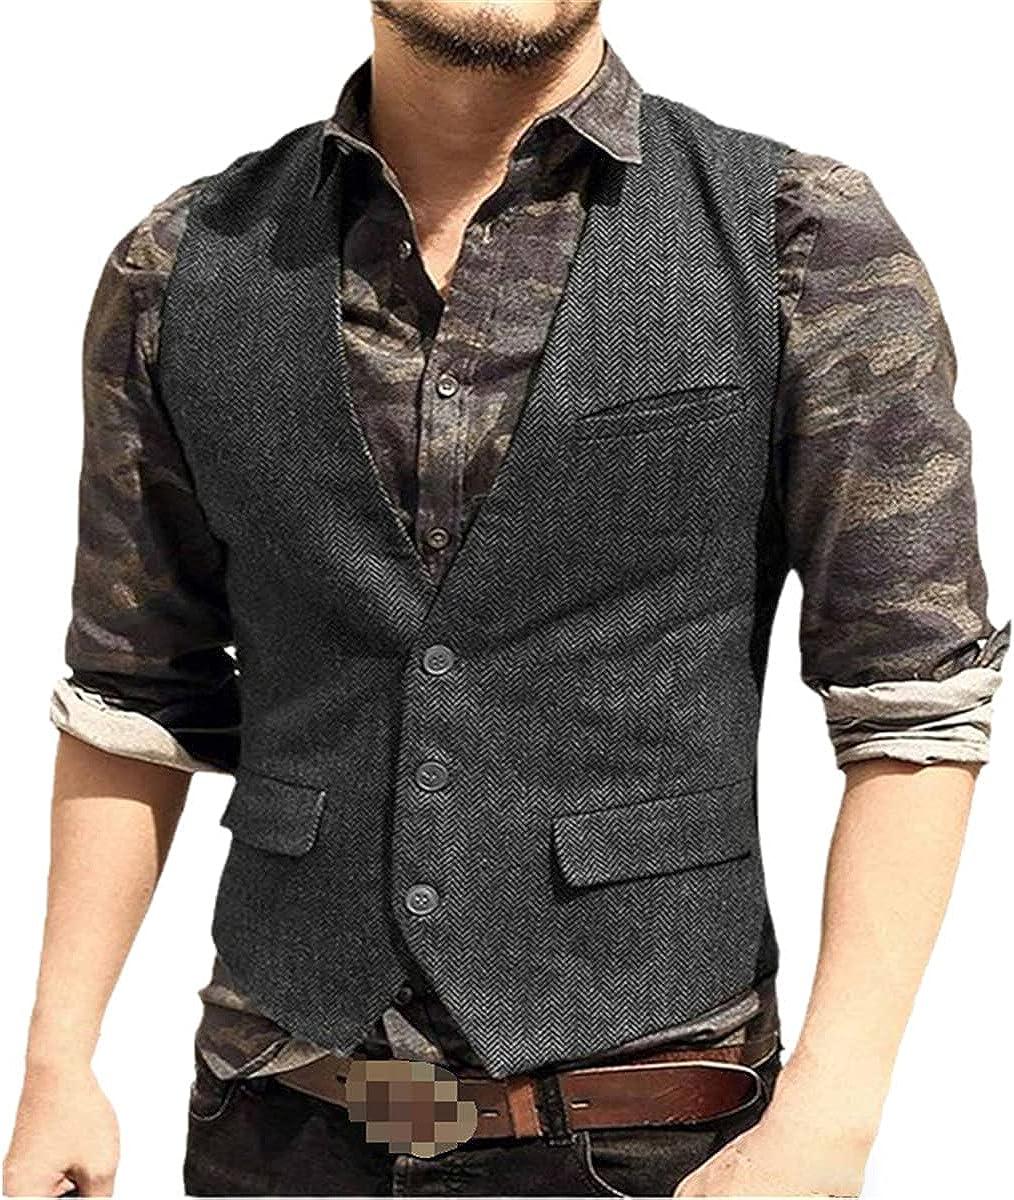 Suit vest vest V-neck wool herringbone tweed vest jacket Slim vest vest casual best man wedding